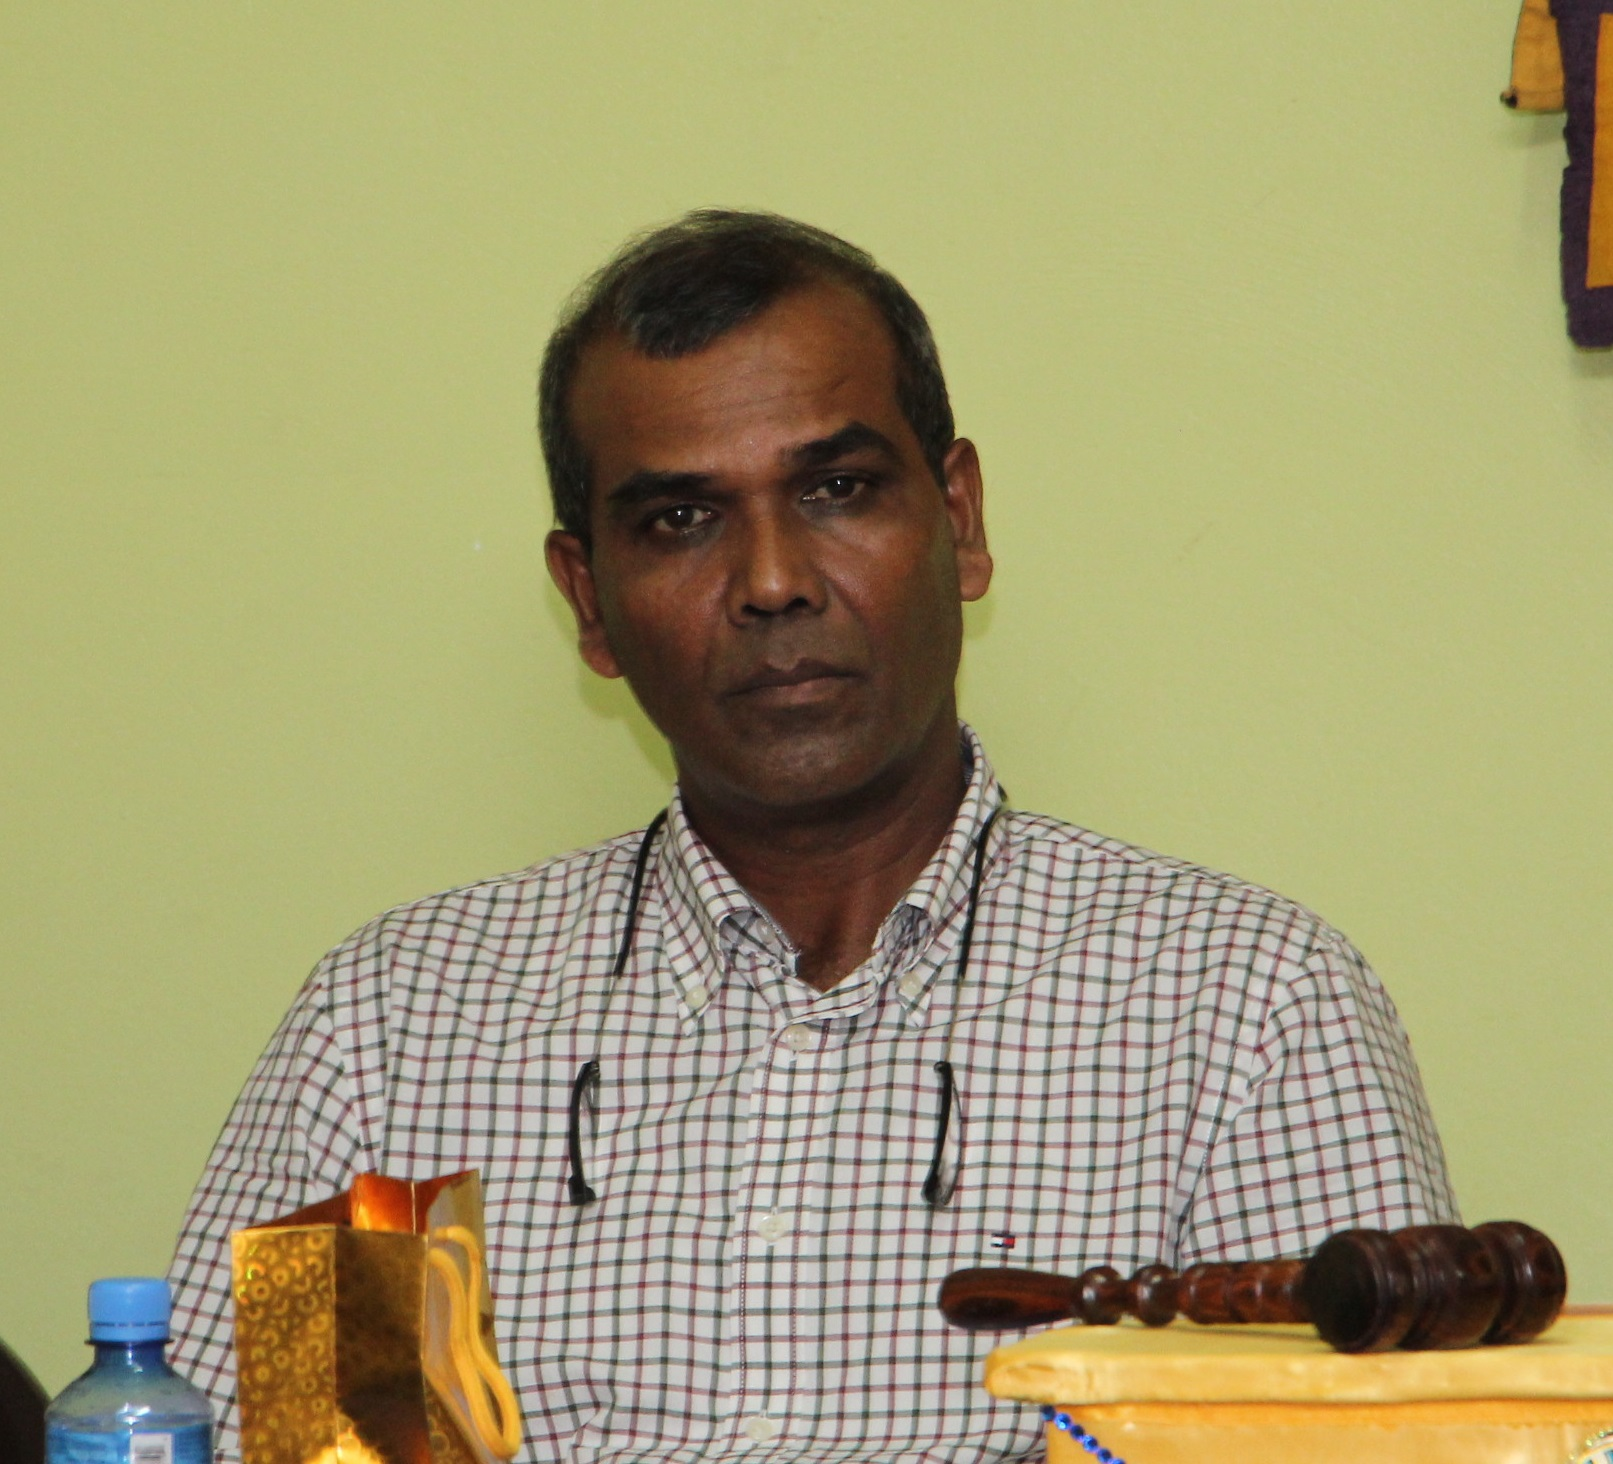 Professor Sieuwnath Naipal